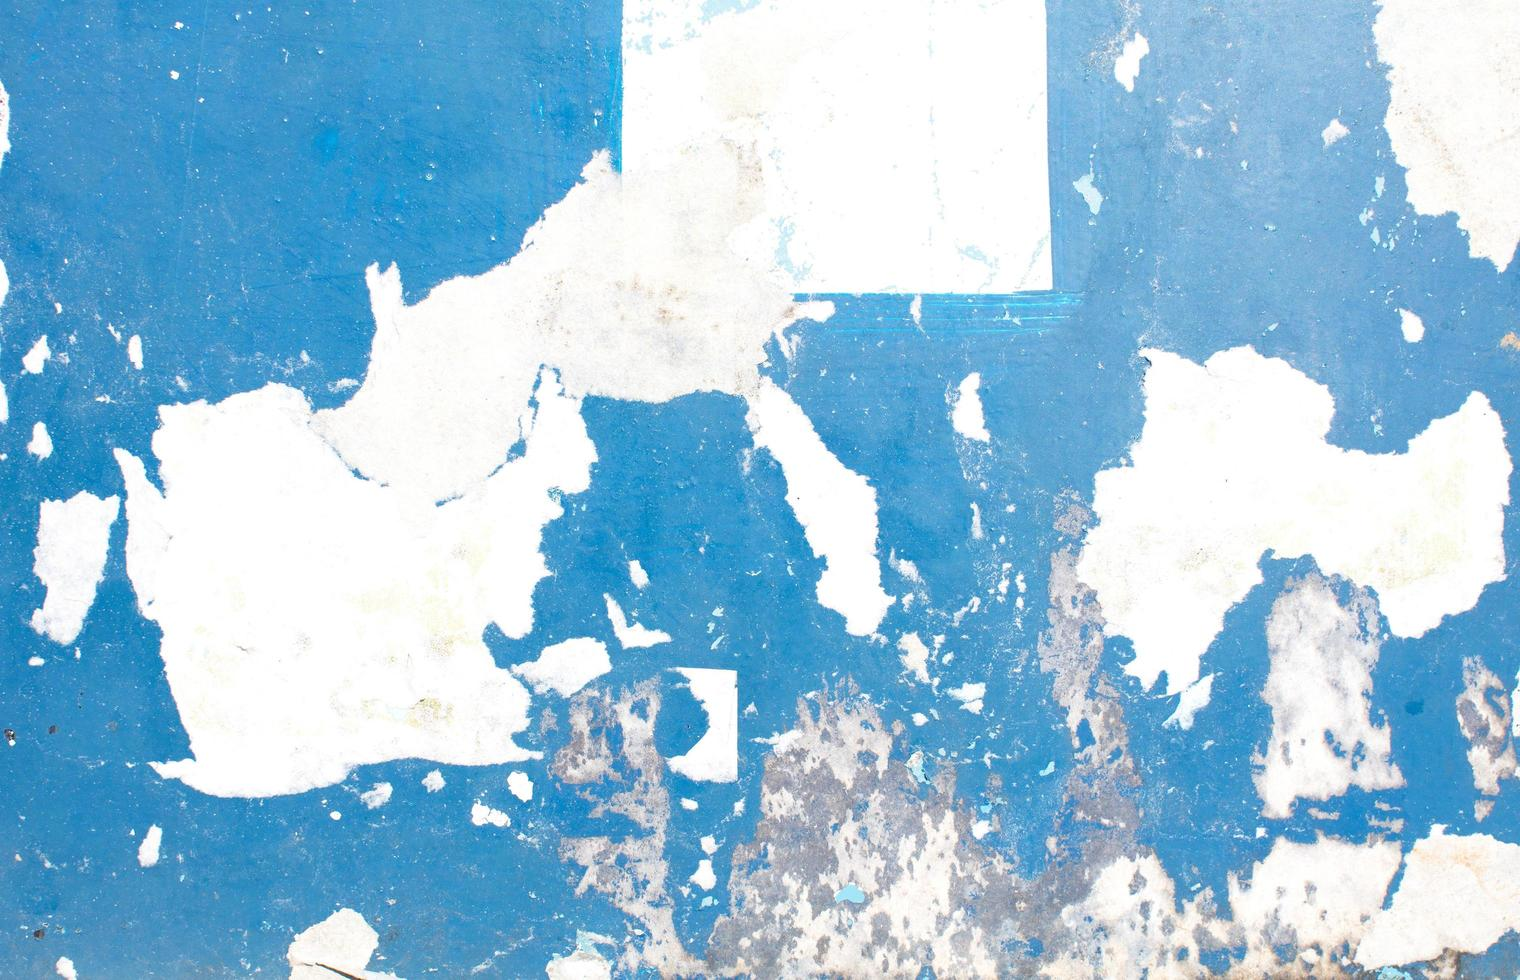 tinta azul lascada foto